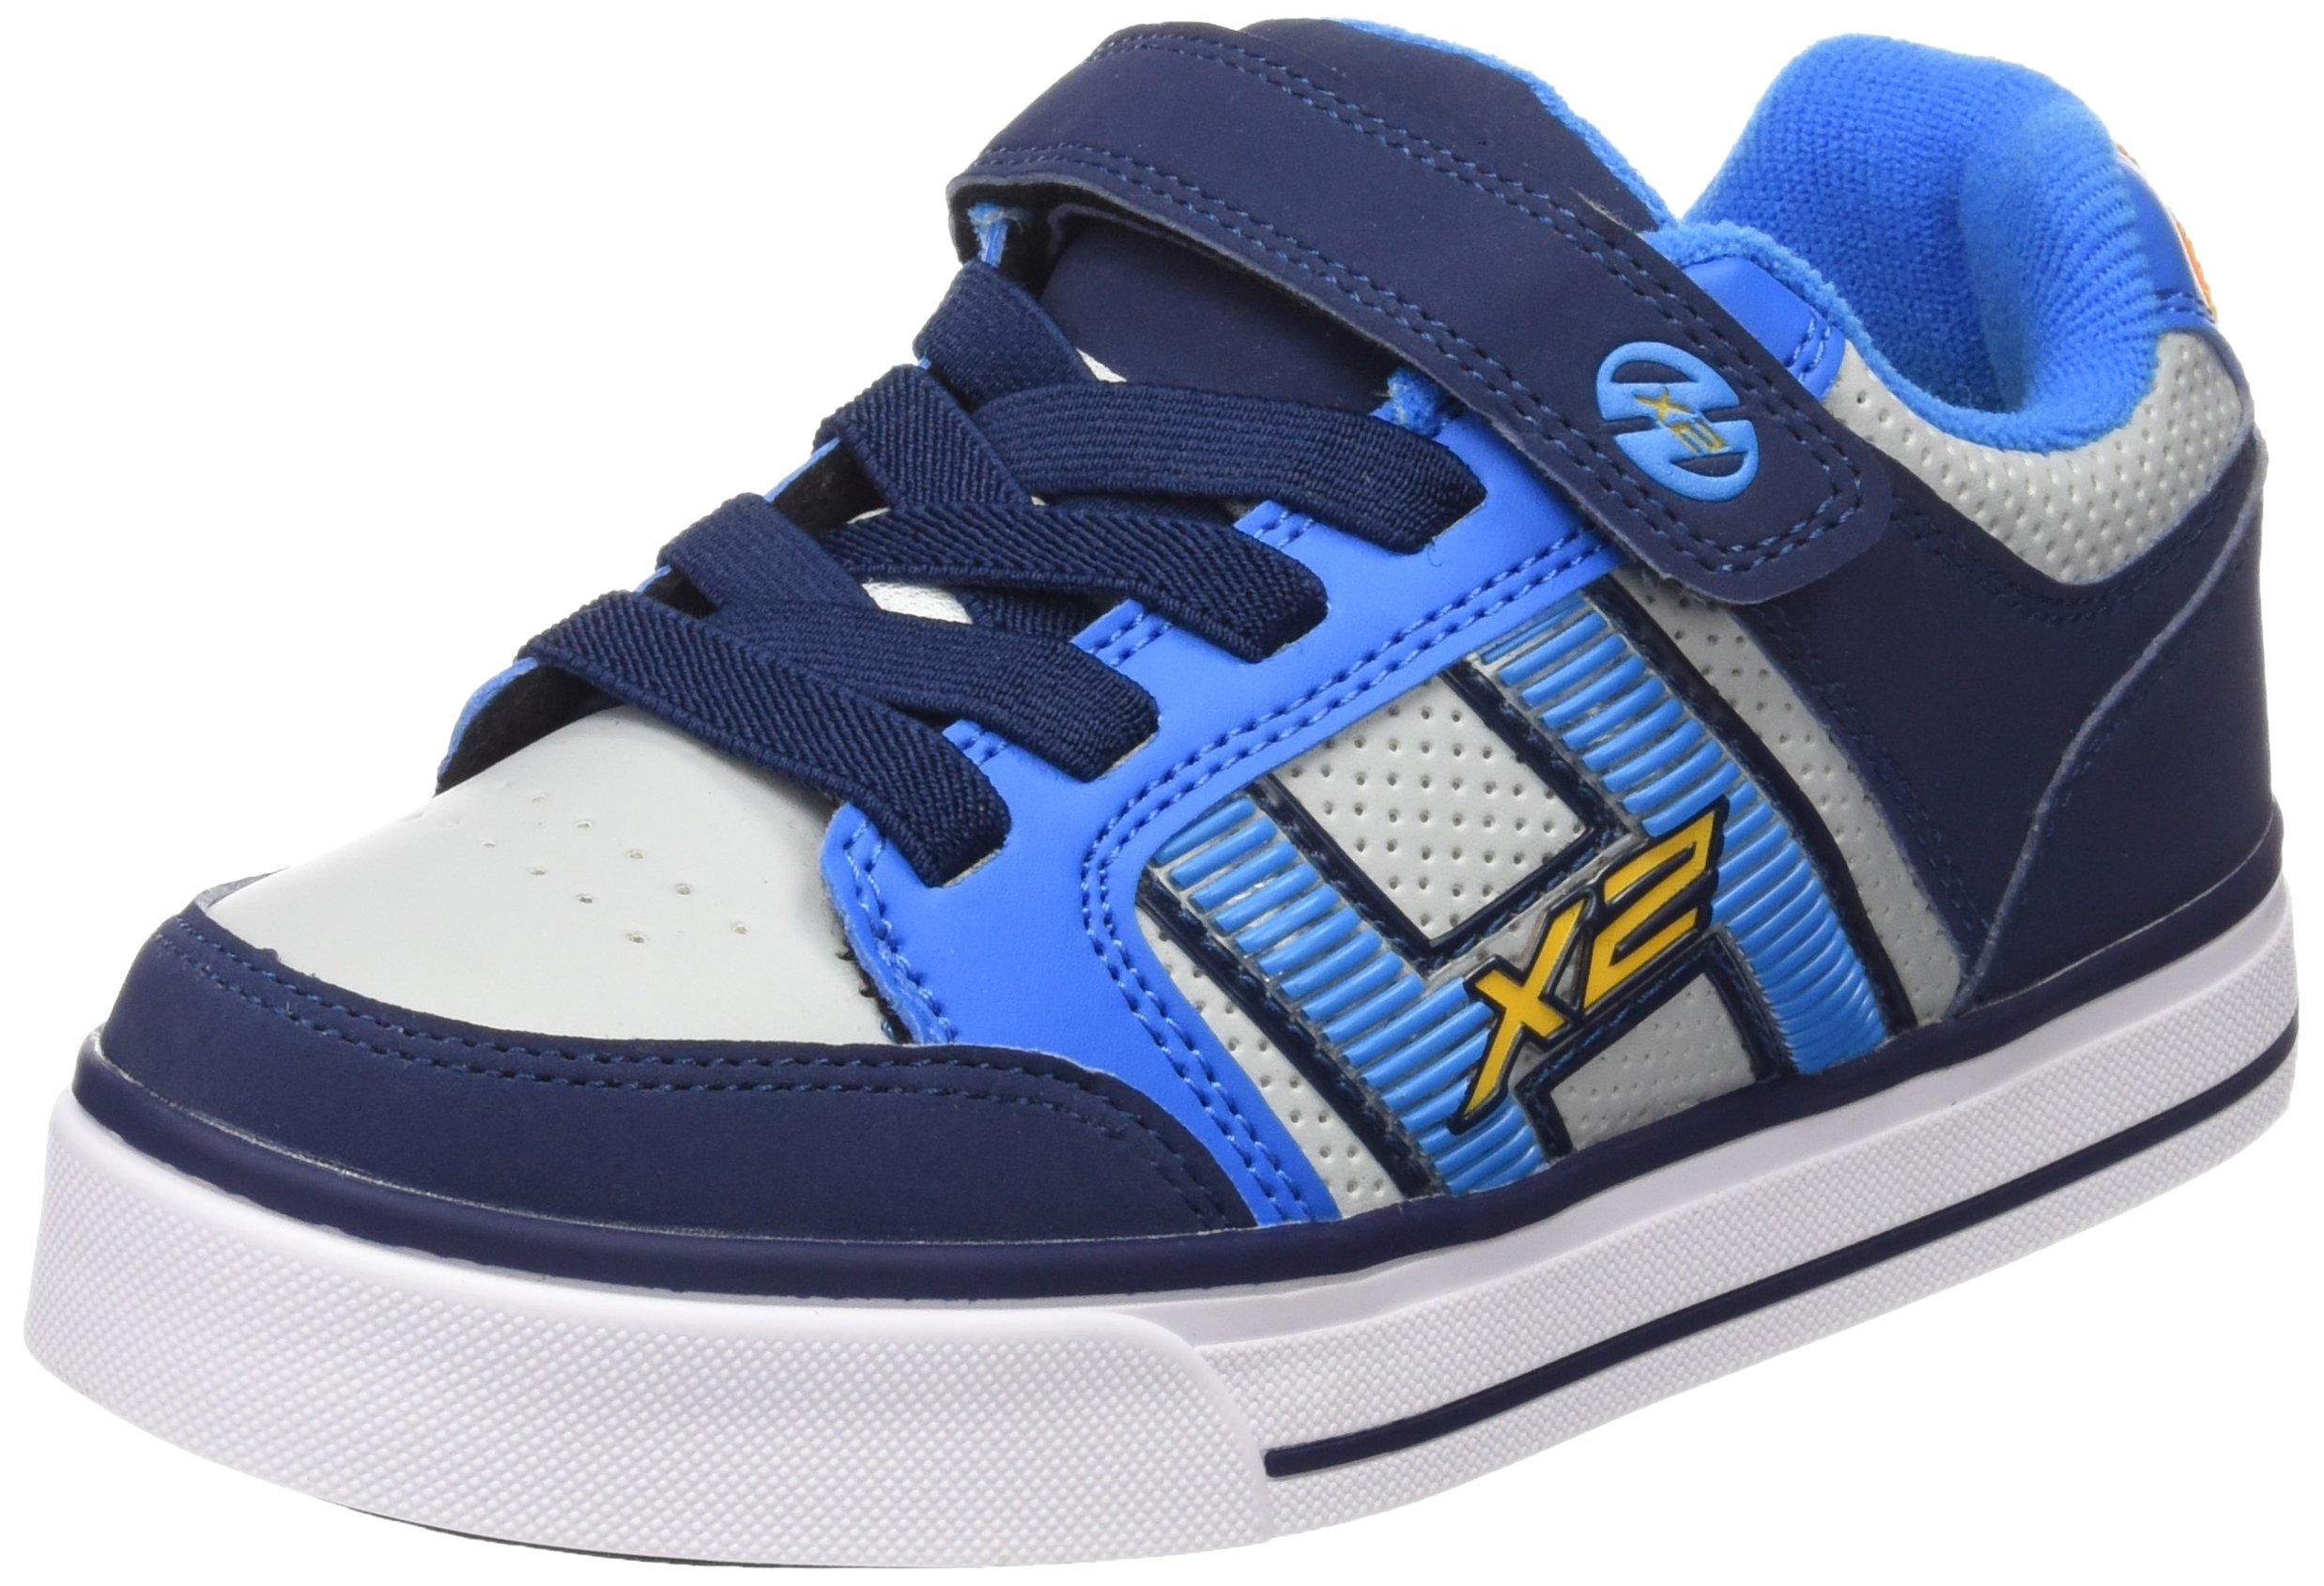 Heelys Bolt Plus X2 Sneaker (Little Kid/Big Kid), Navy/New Blue/Lunar Grey, 13 M US Little Kid by Heelys